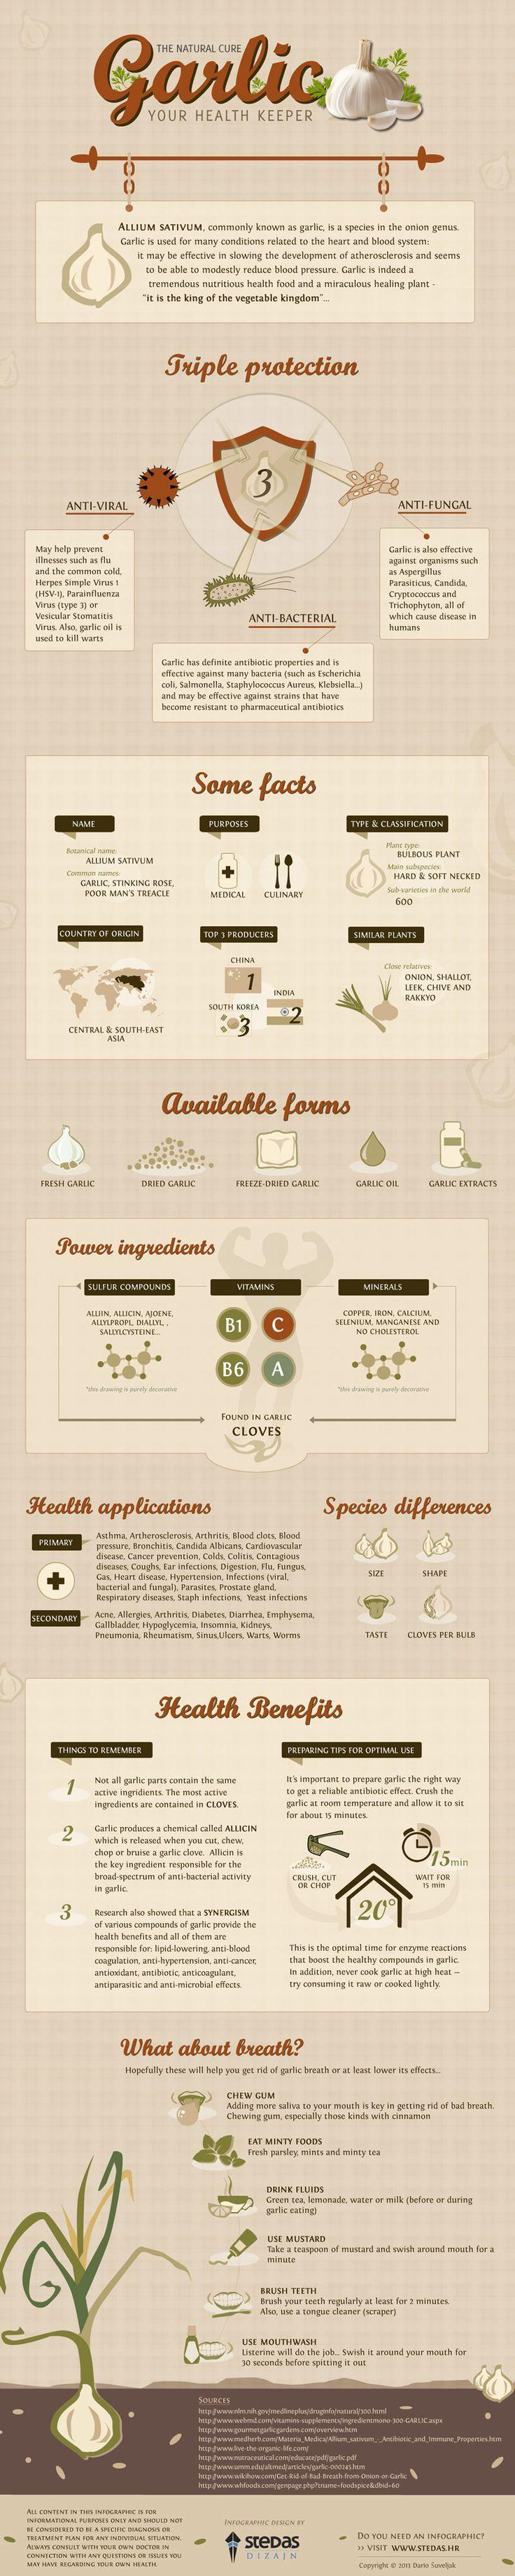 Garlic's Health Benefits   JoySpring's all natural, Odorless Garlic Supplement supports heart health at an affordable price: https://hellojoyspring.com/products/garlic-supplement-allicin-joyspring :